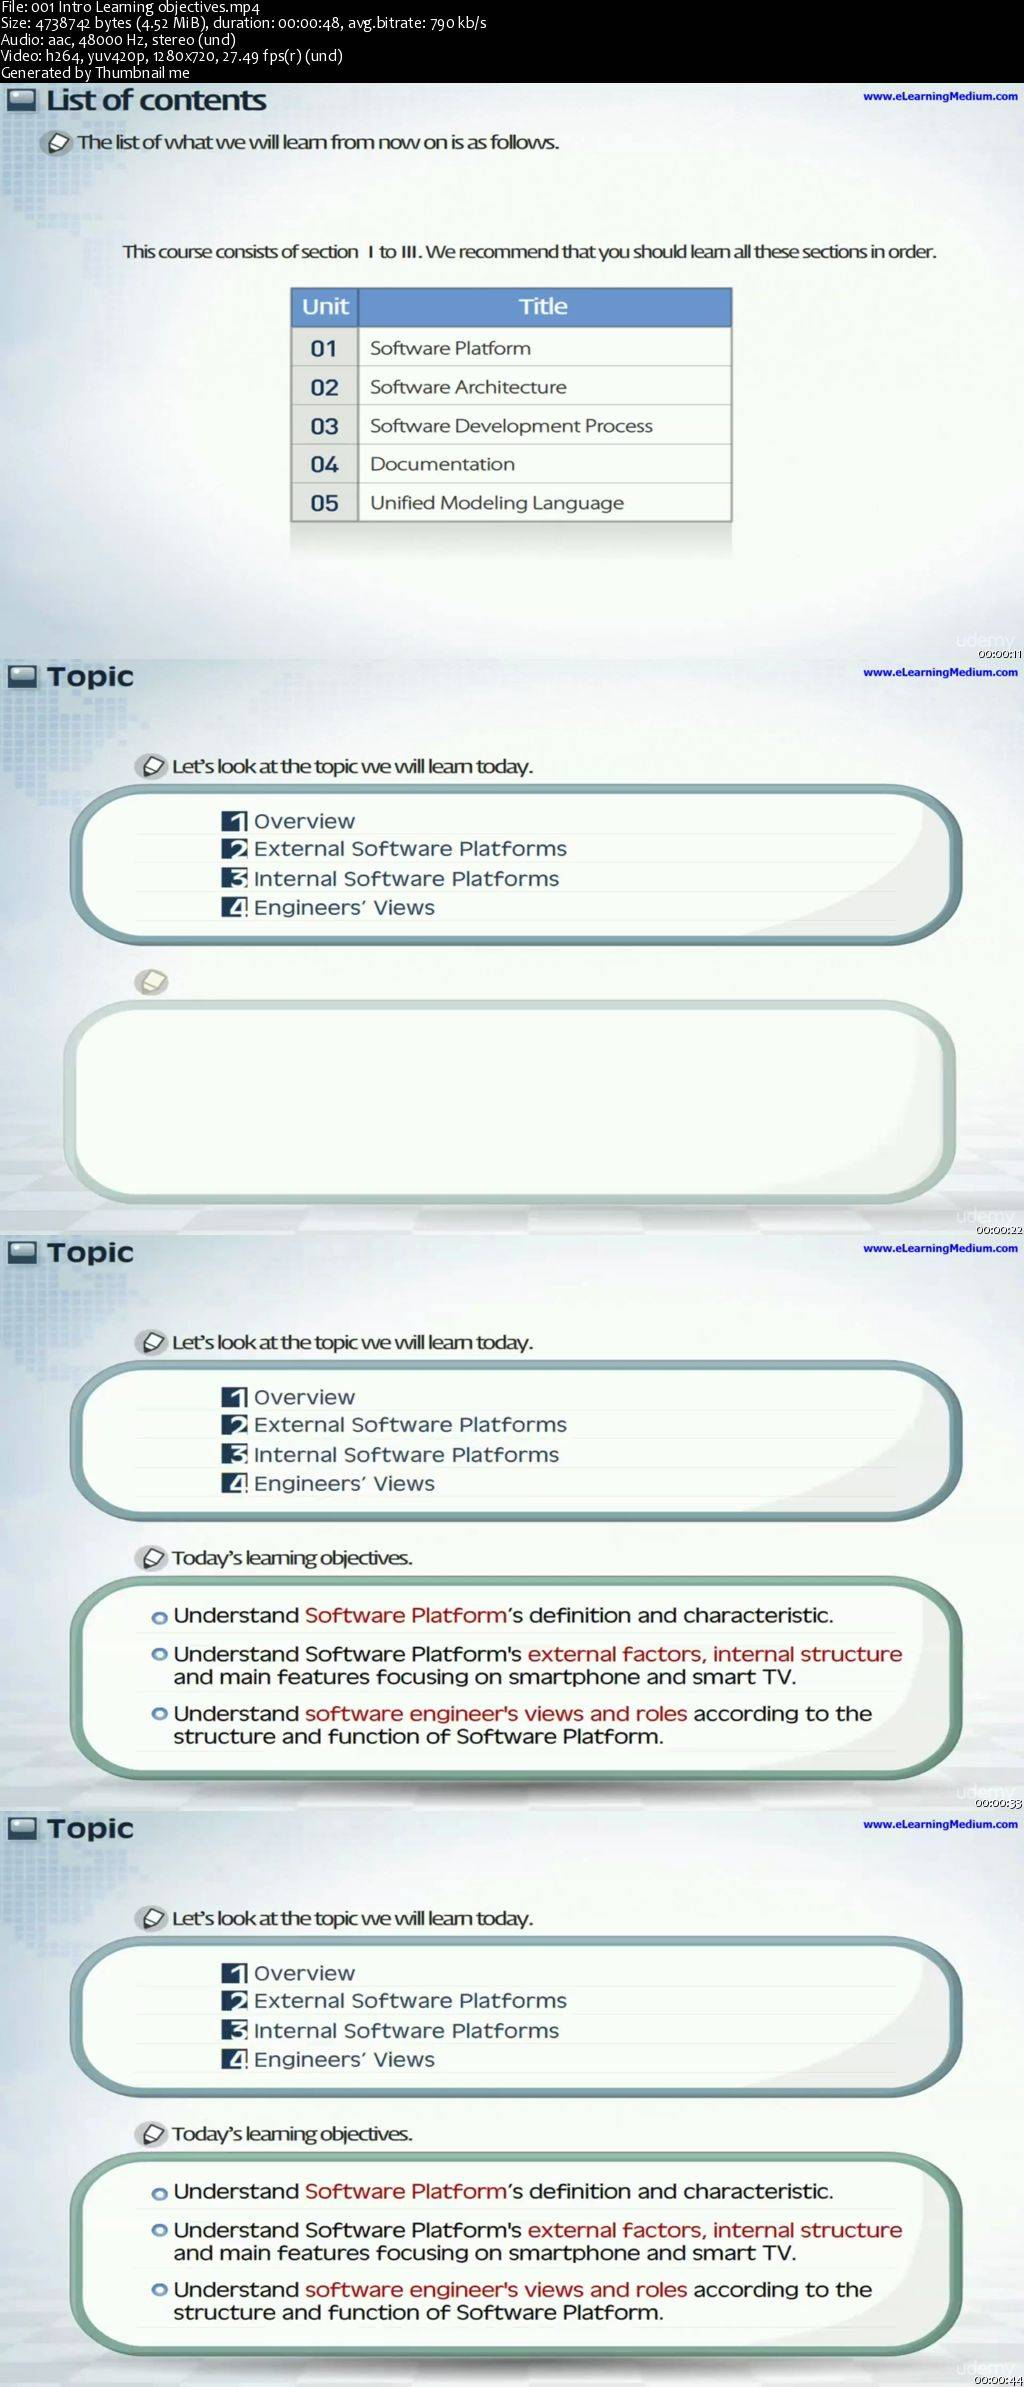 Software Development Process(13)-Software Architecture ,UML